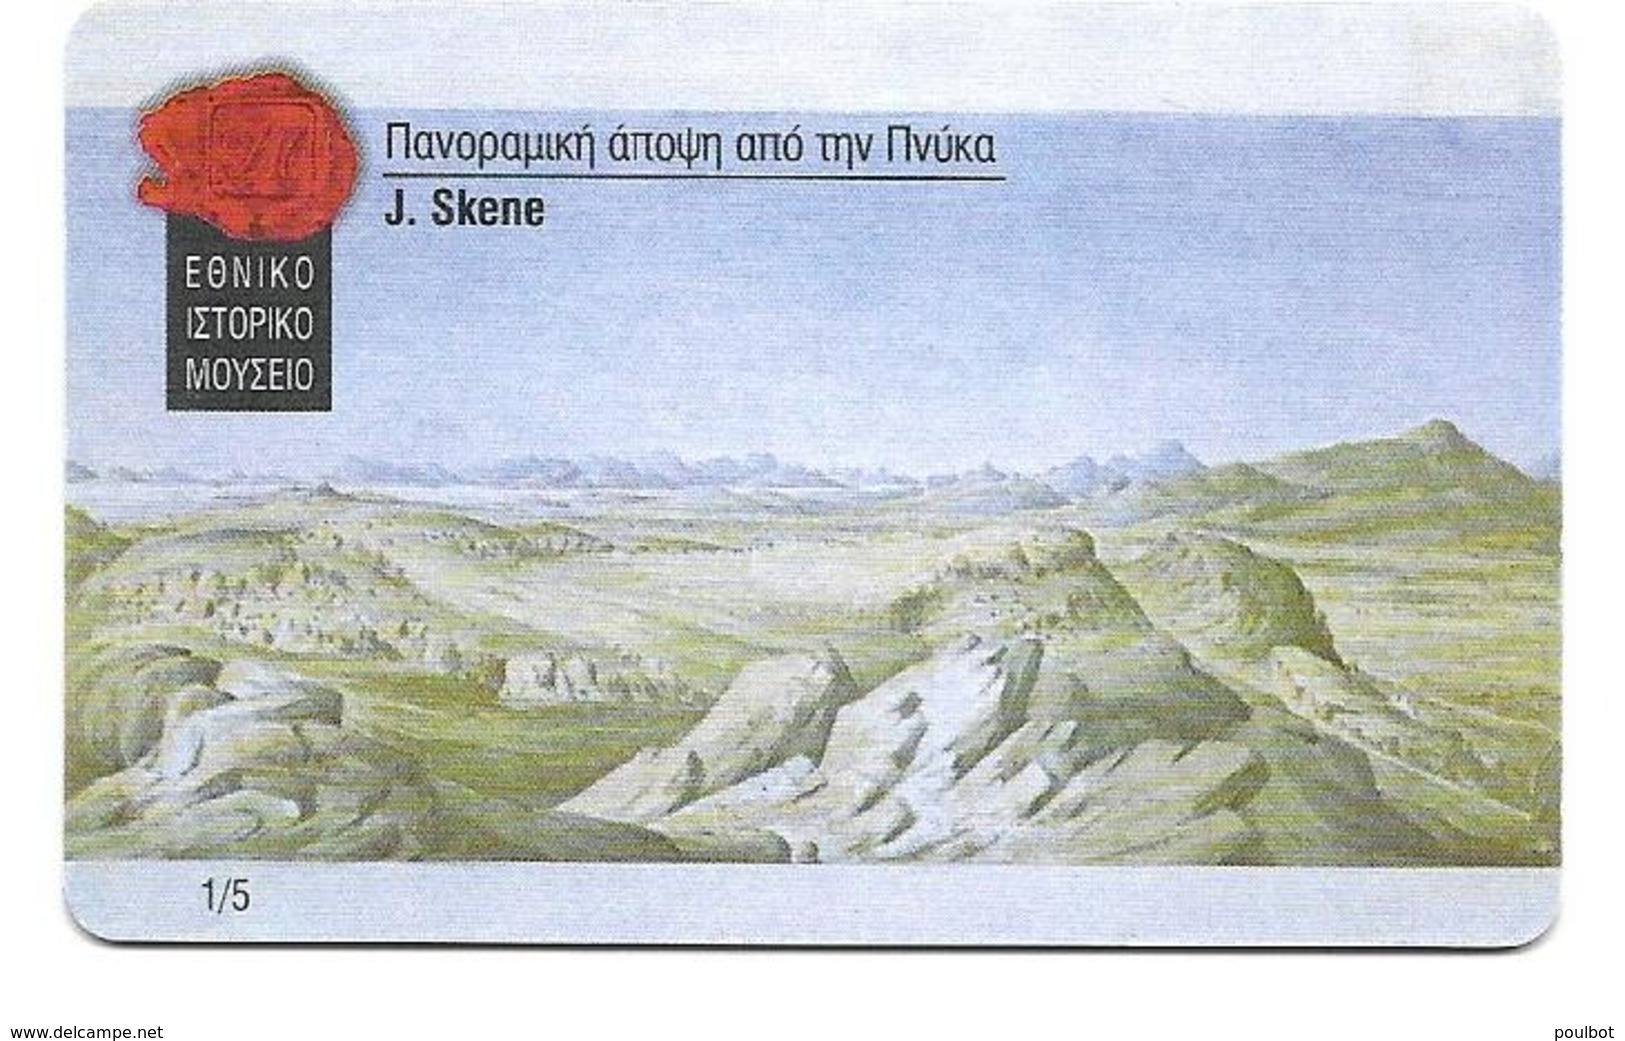 Télécarte Grèce J Skene 1/5 - Greece